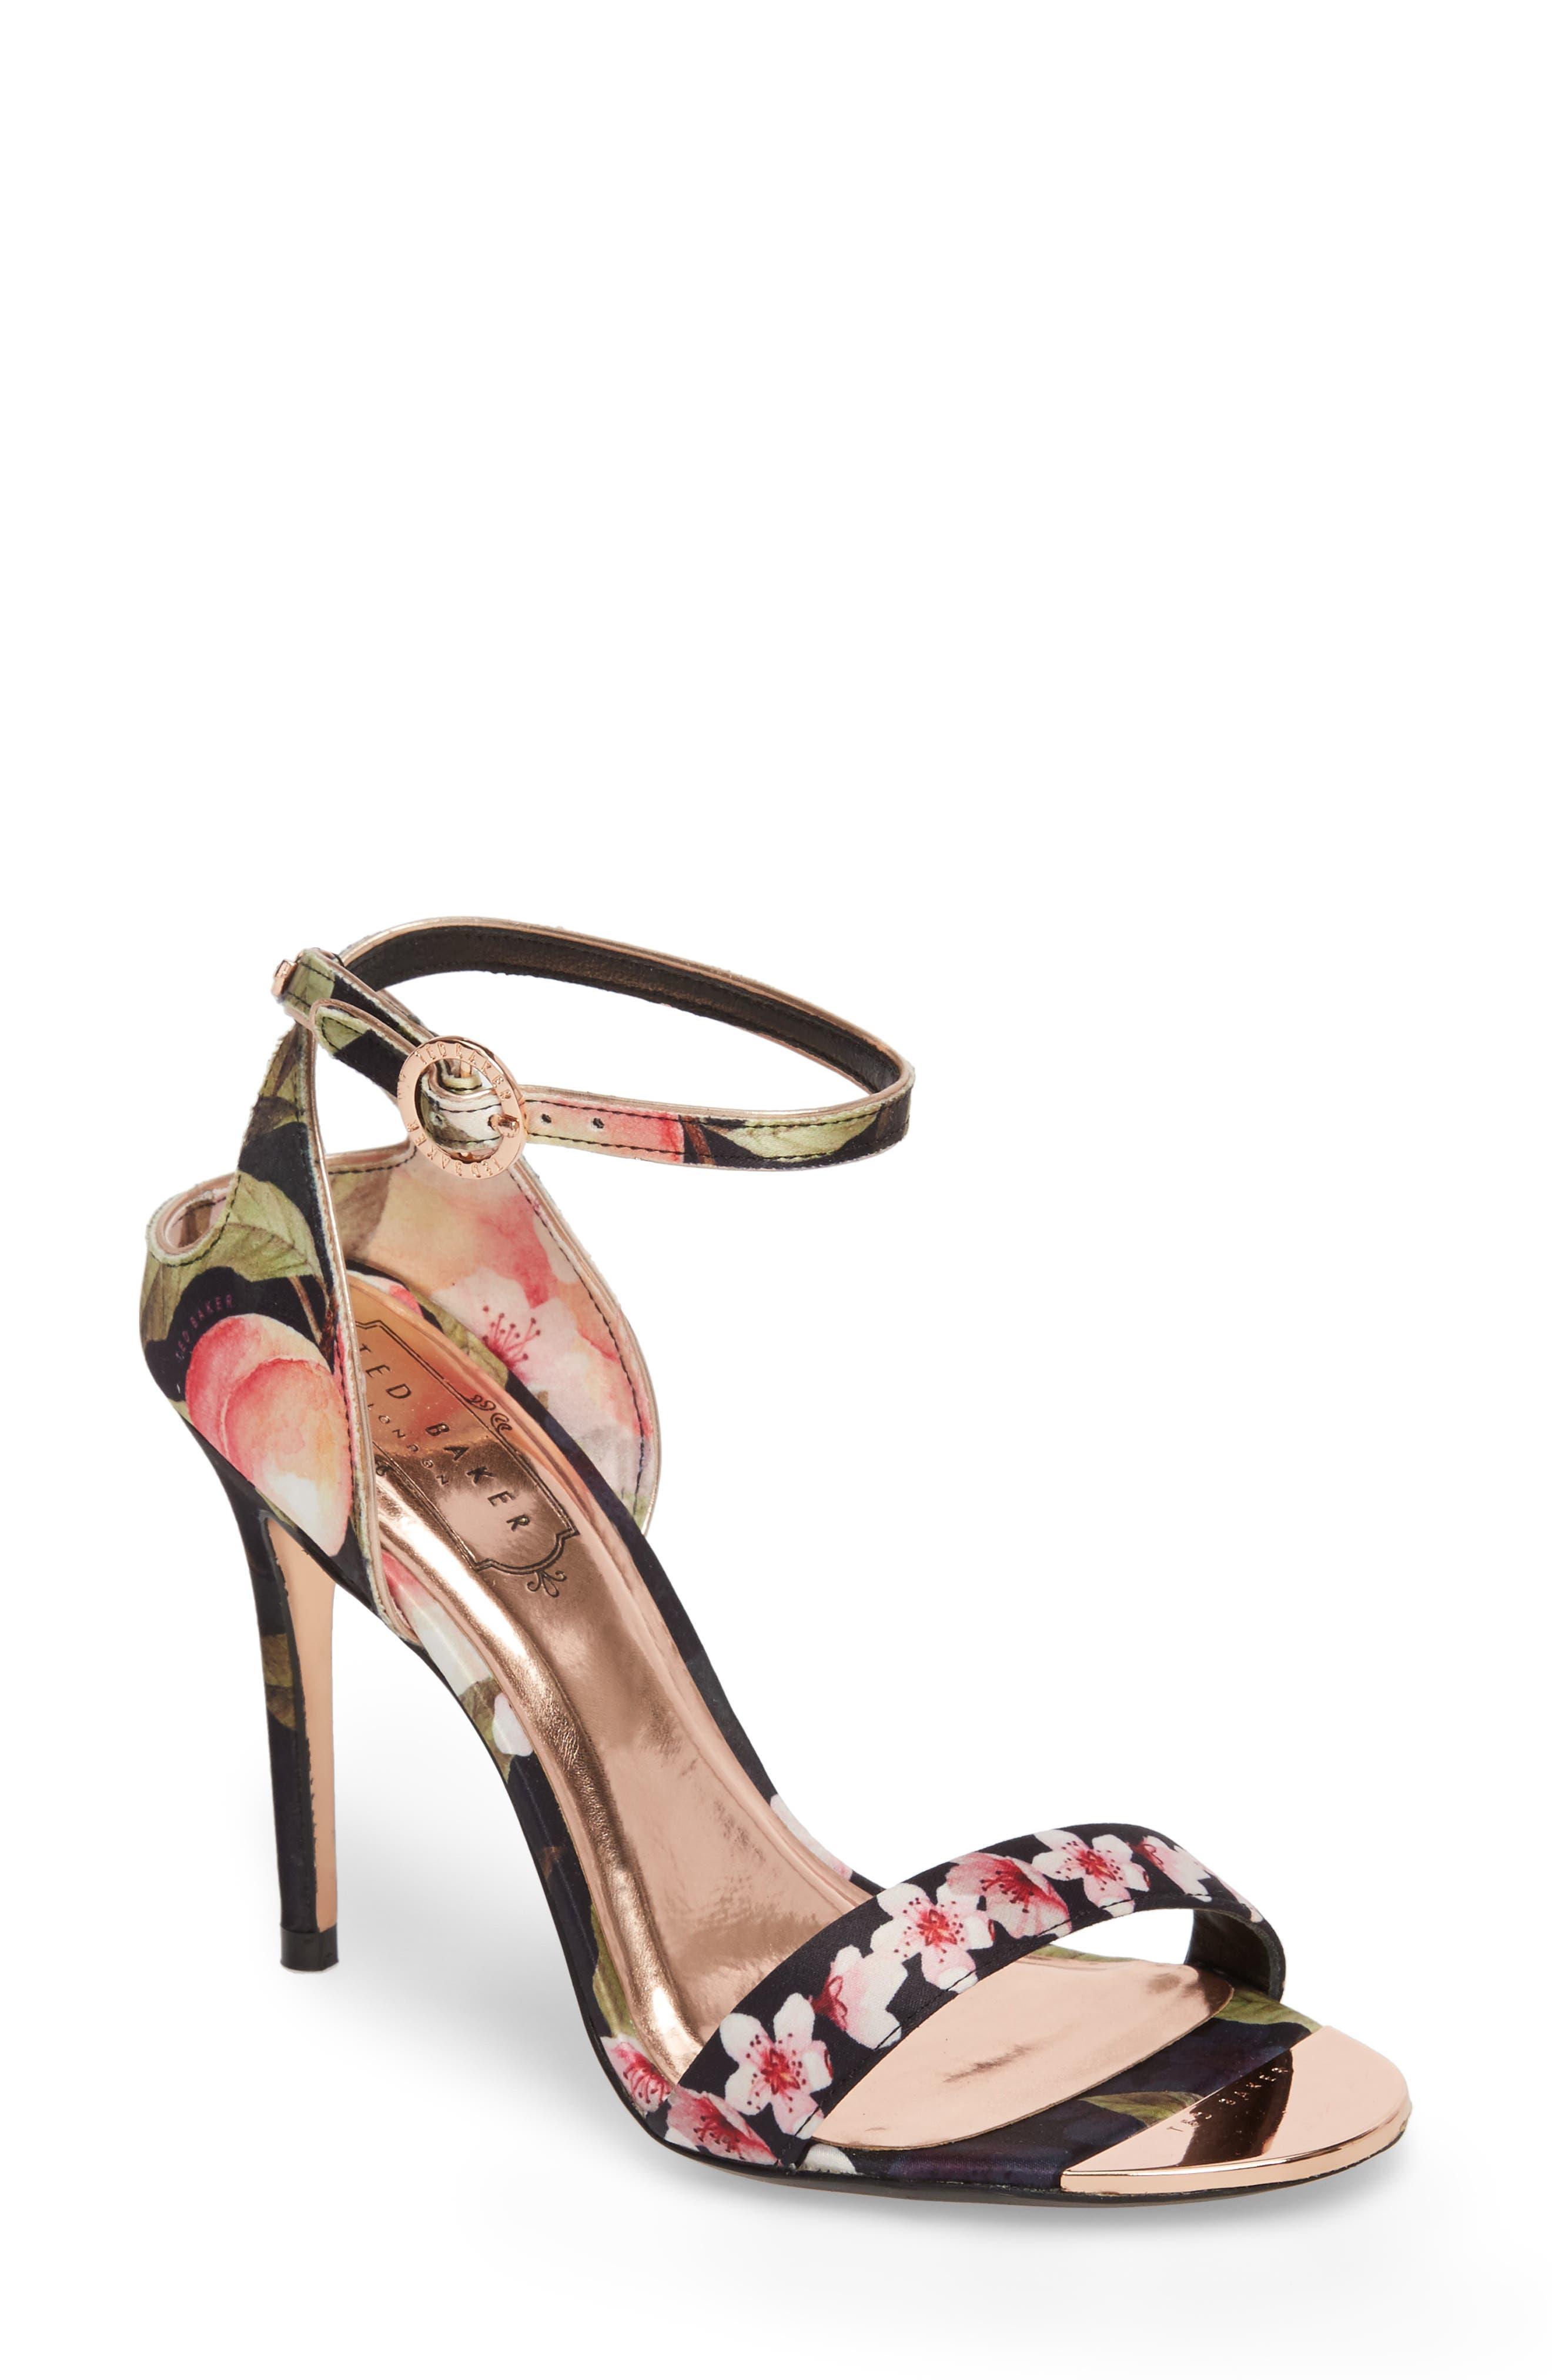 Mirobep Sandal,                             Main thumbnail 1, color,                             Peach Blossom Black Satin